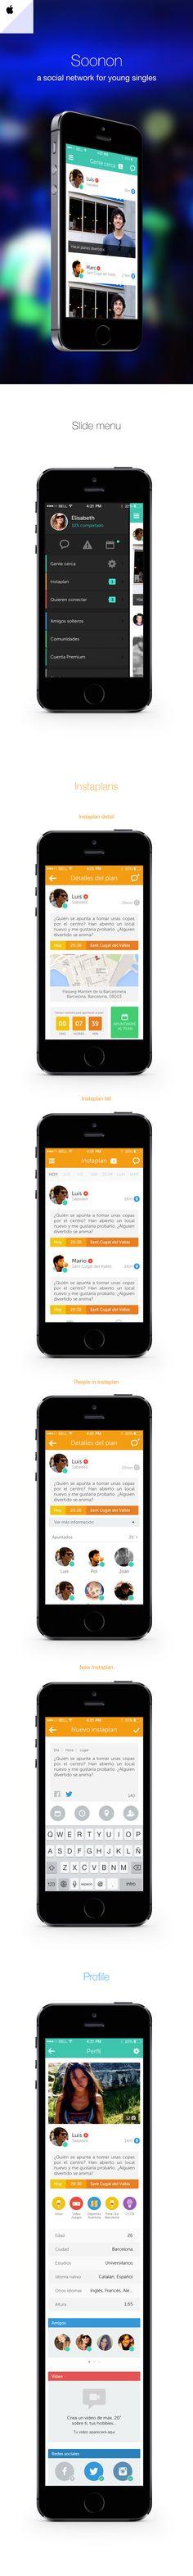 Ios Ui, User Experience Design, Screen Design, User Interface Design, Big Challenge, Ui Kit, Ui Ux Design, Mobile Design, Mobile Ui